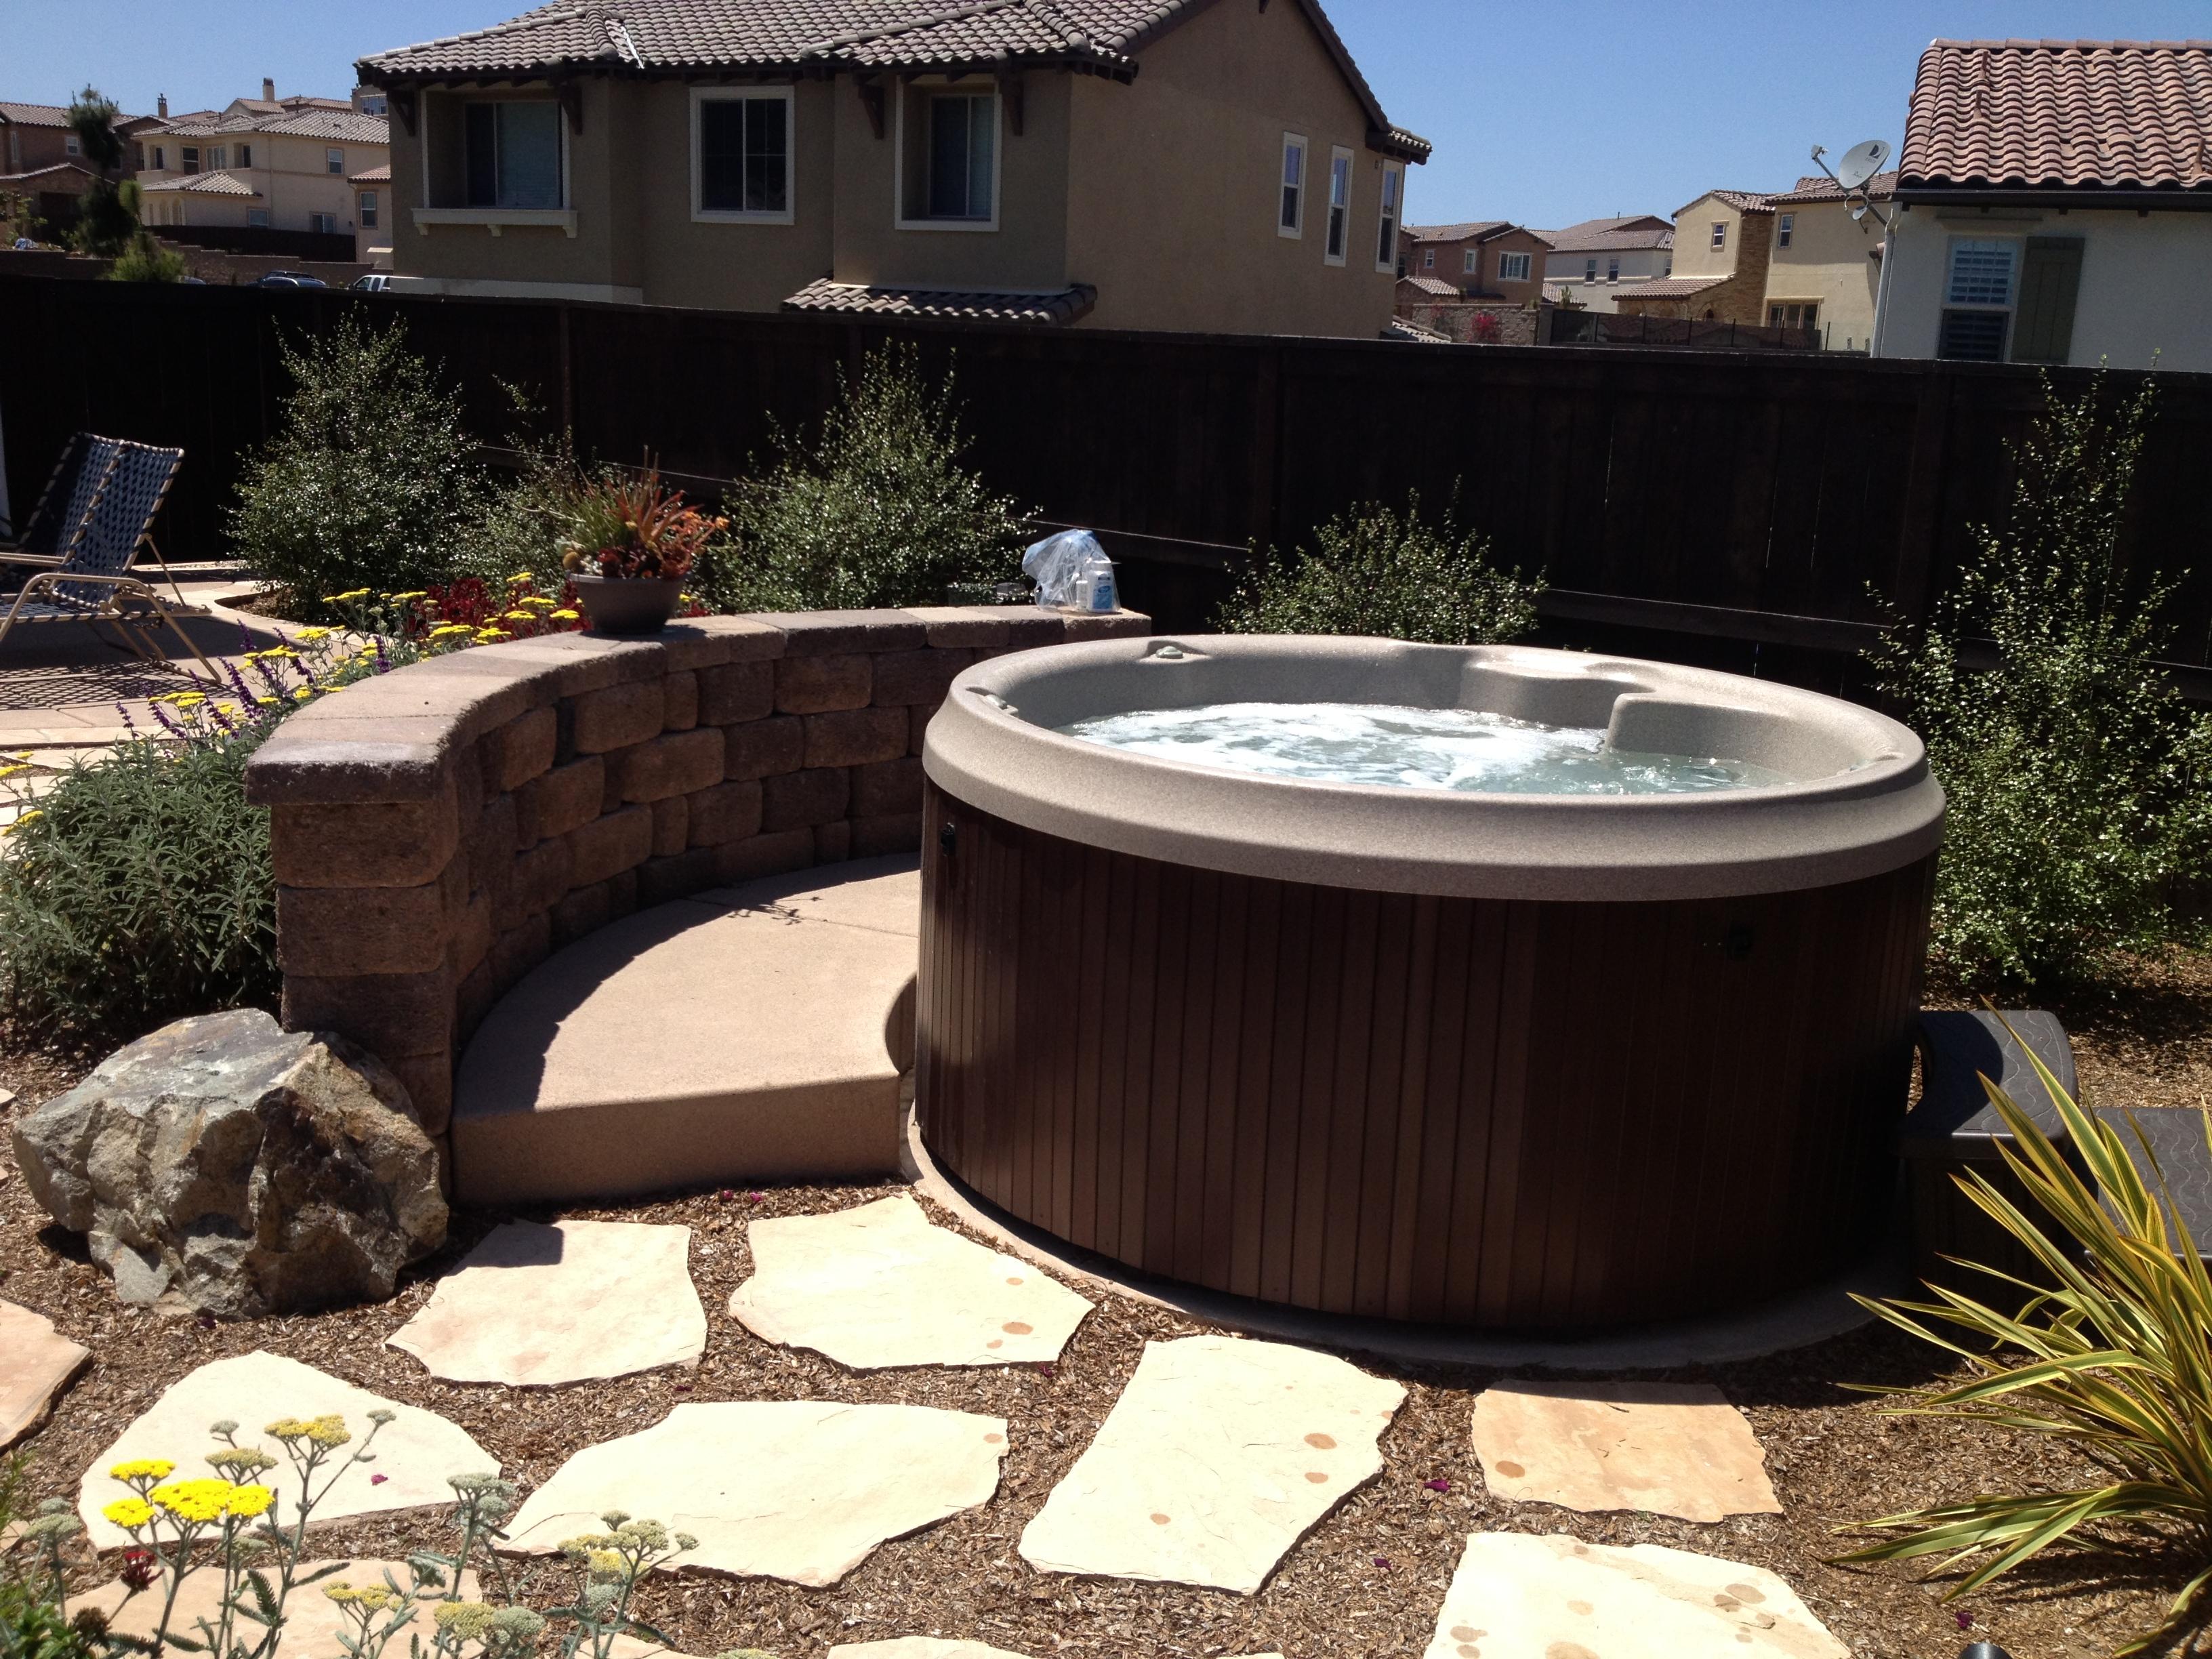 j 210 round hot tub seats 4 adults jets 19. Black Bedroom Furniture Sets. Home Design Ideas